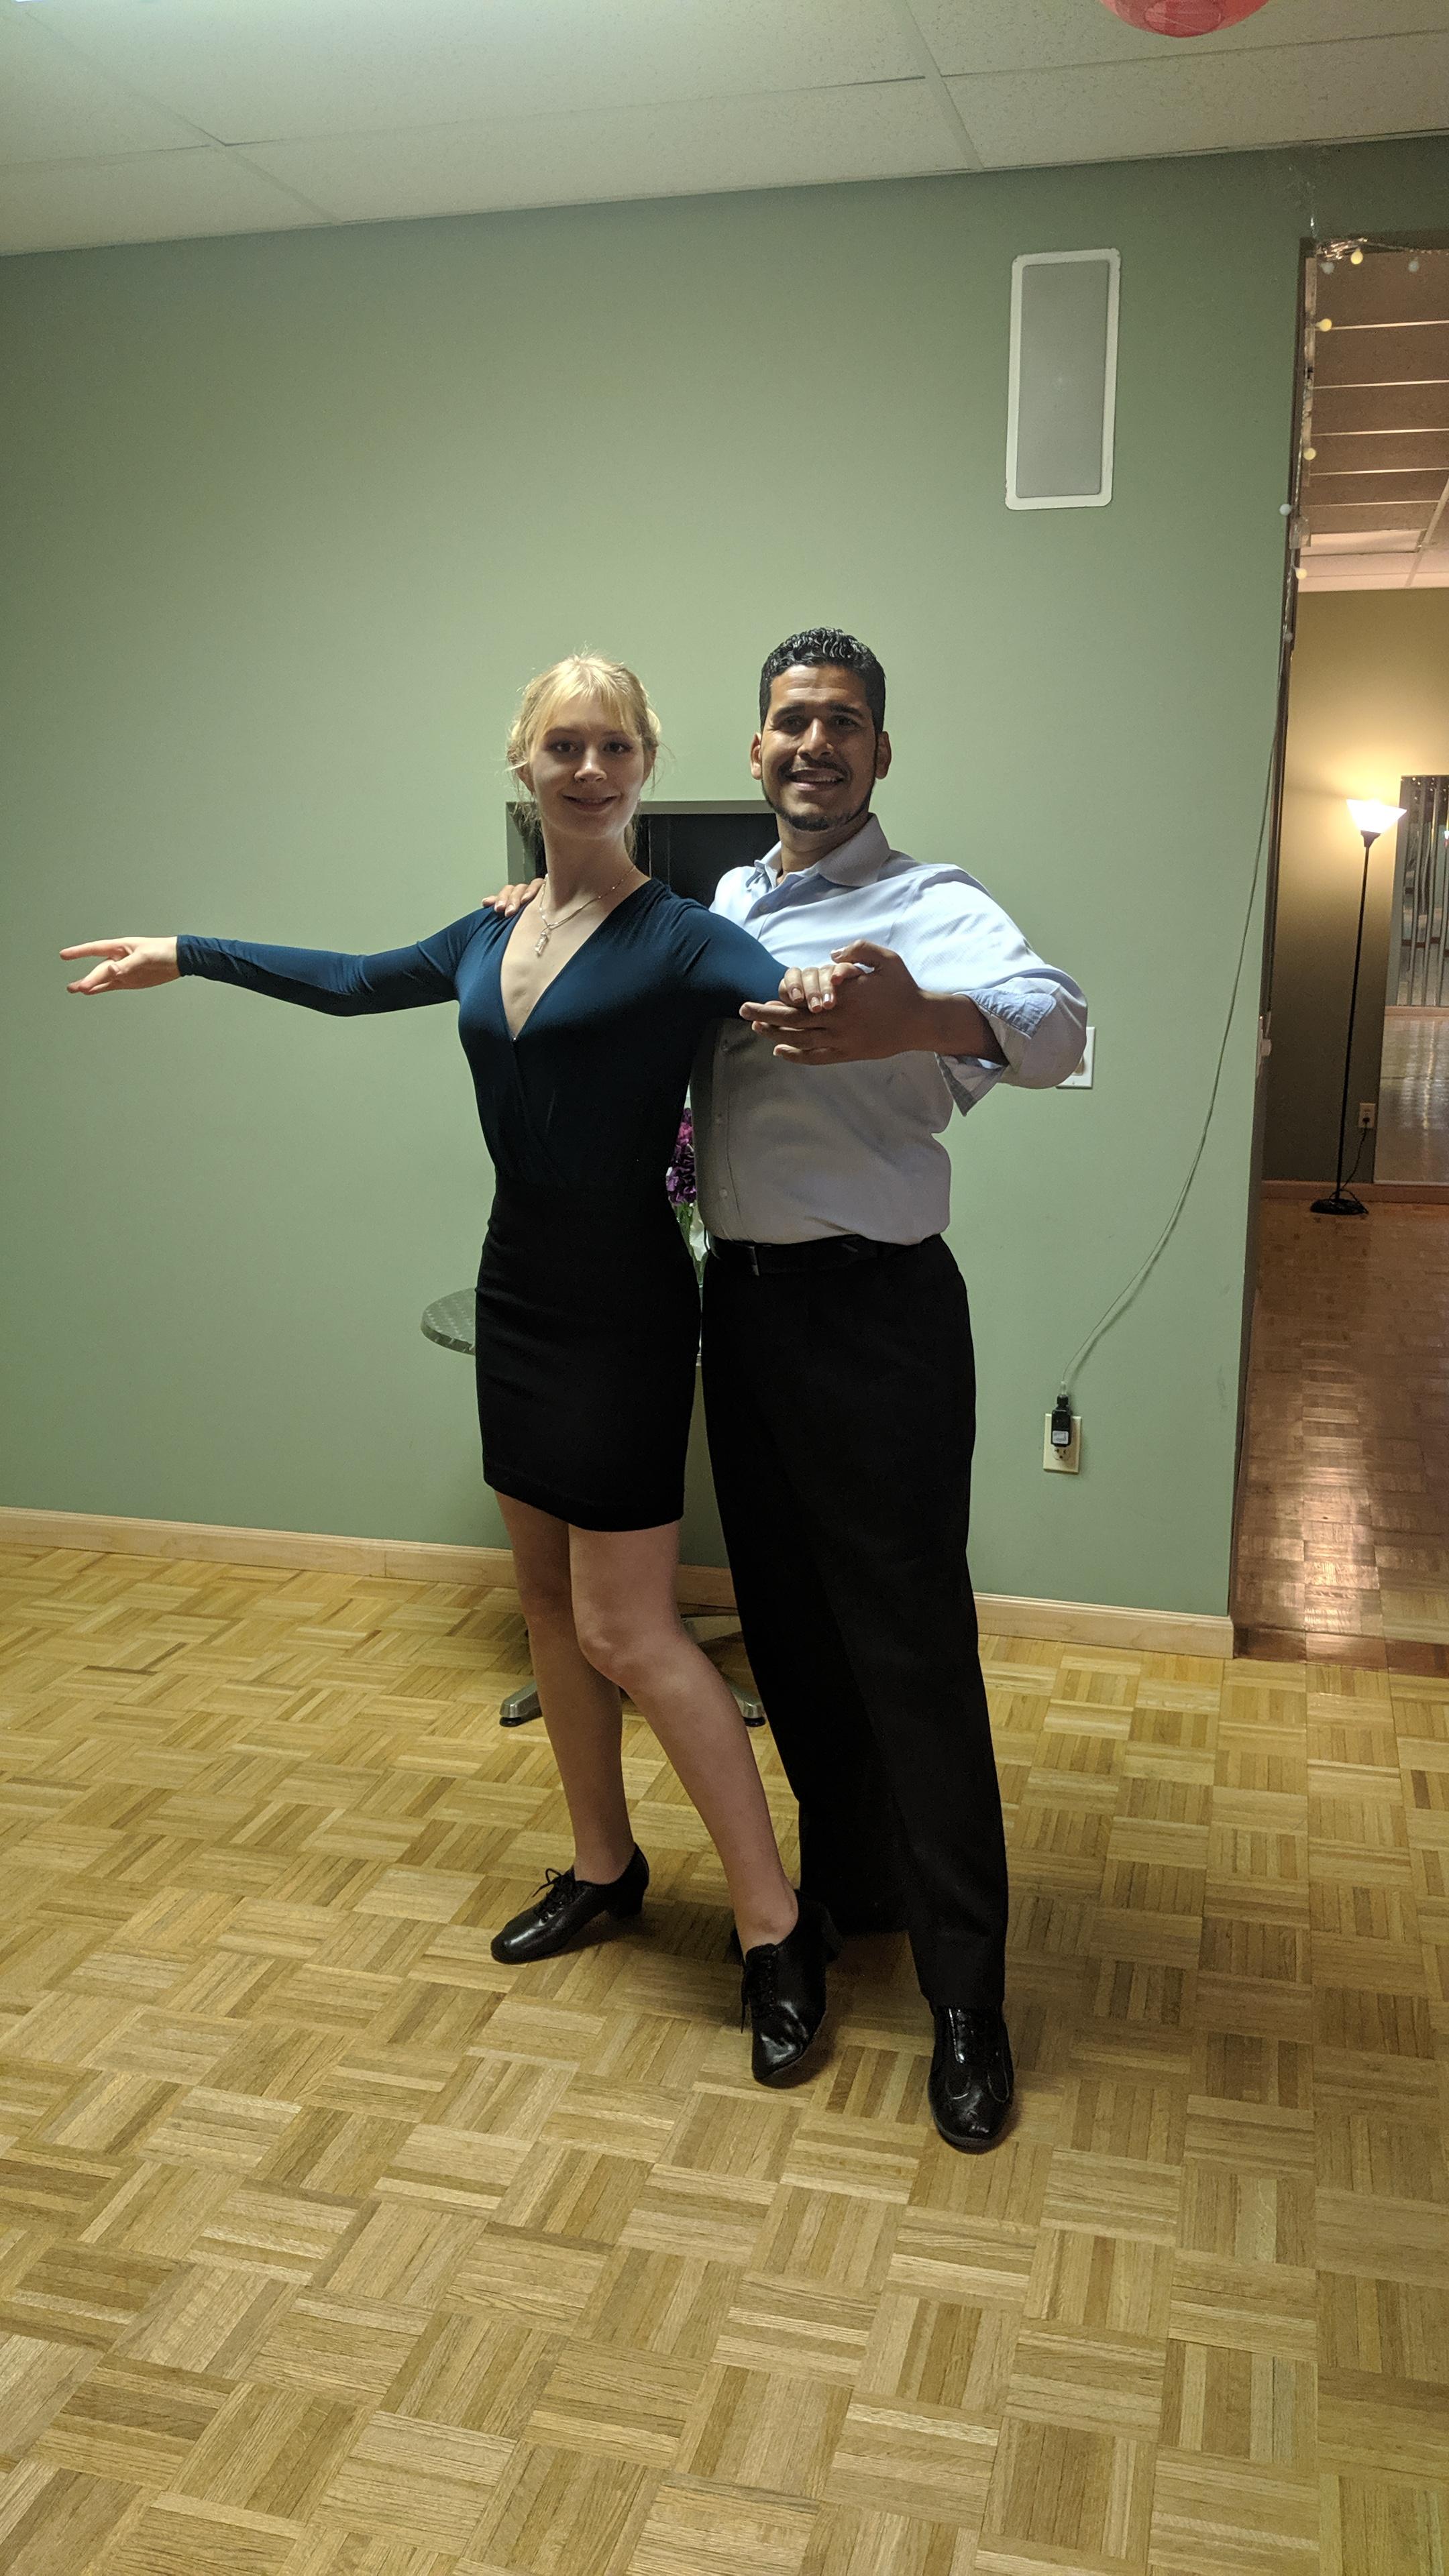 ballroom dance pose